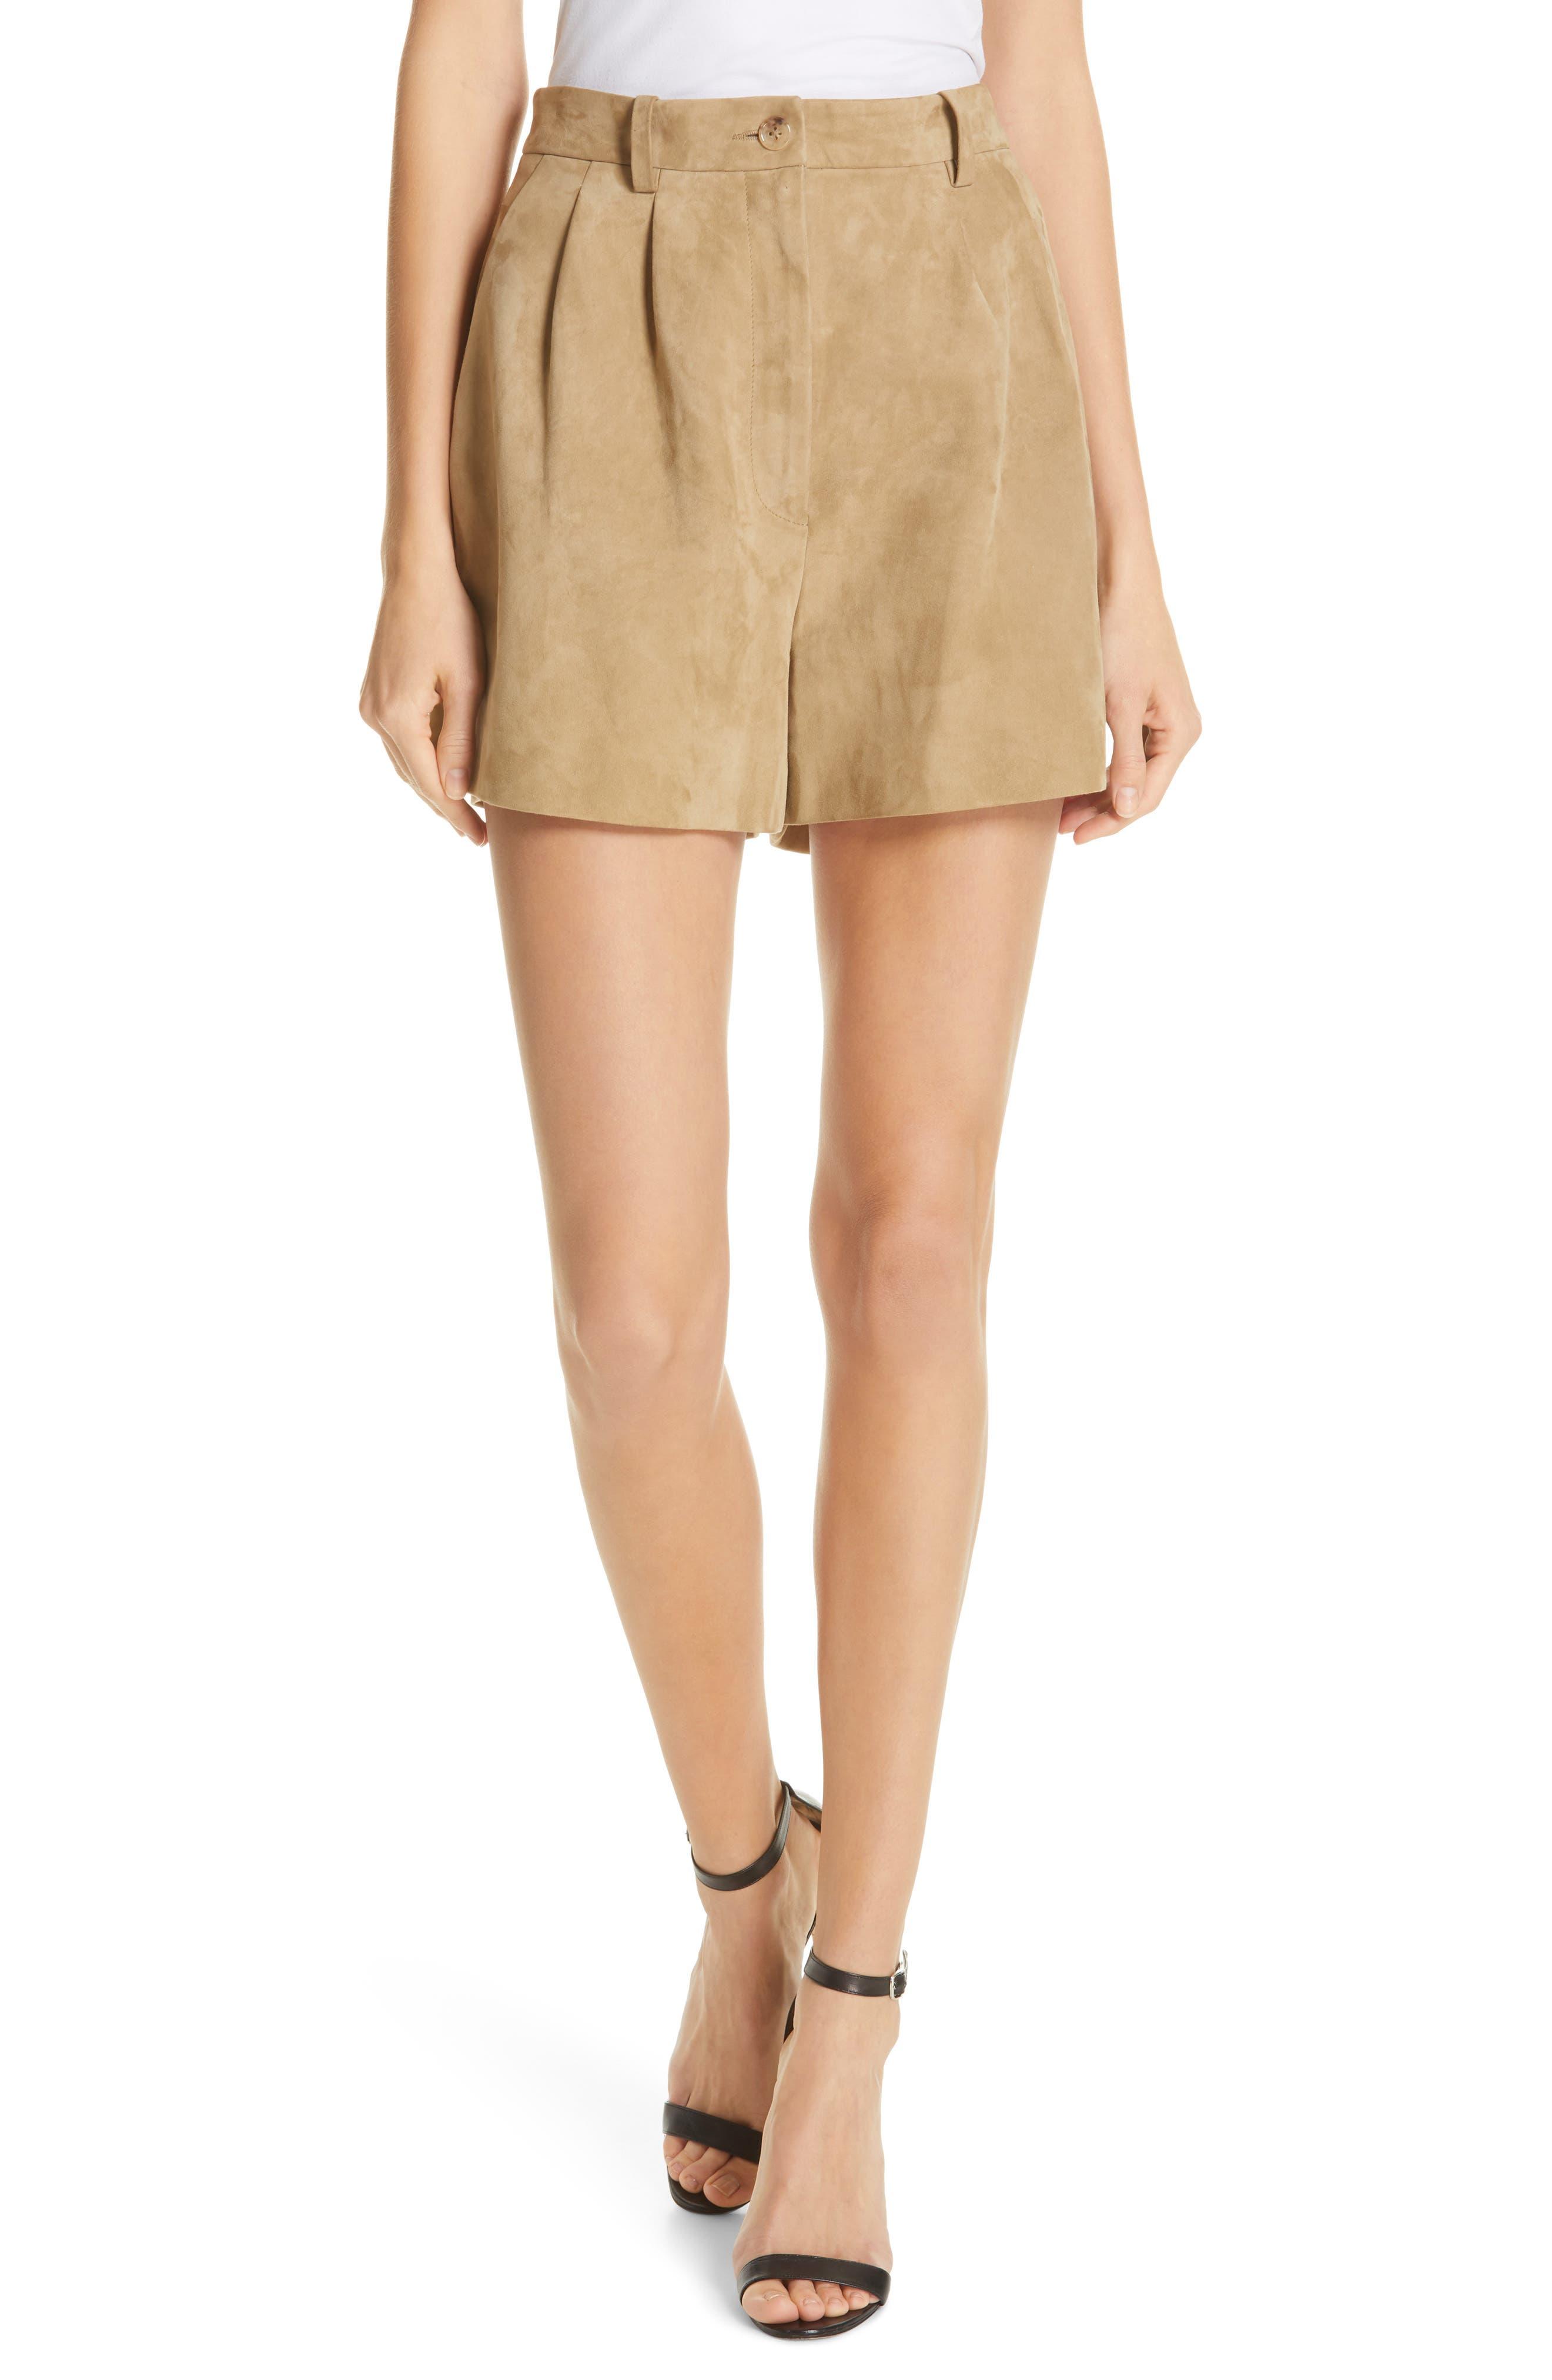 NILI LOTAN Roxana Suede Shorts, Main, color, BEIGE